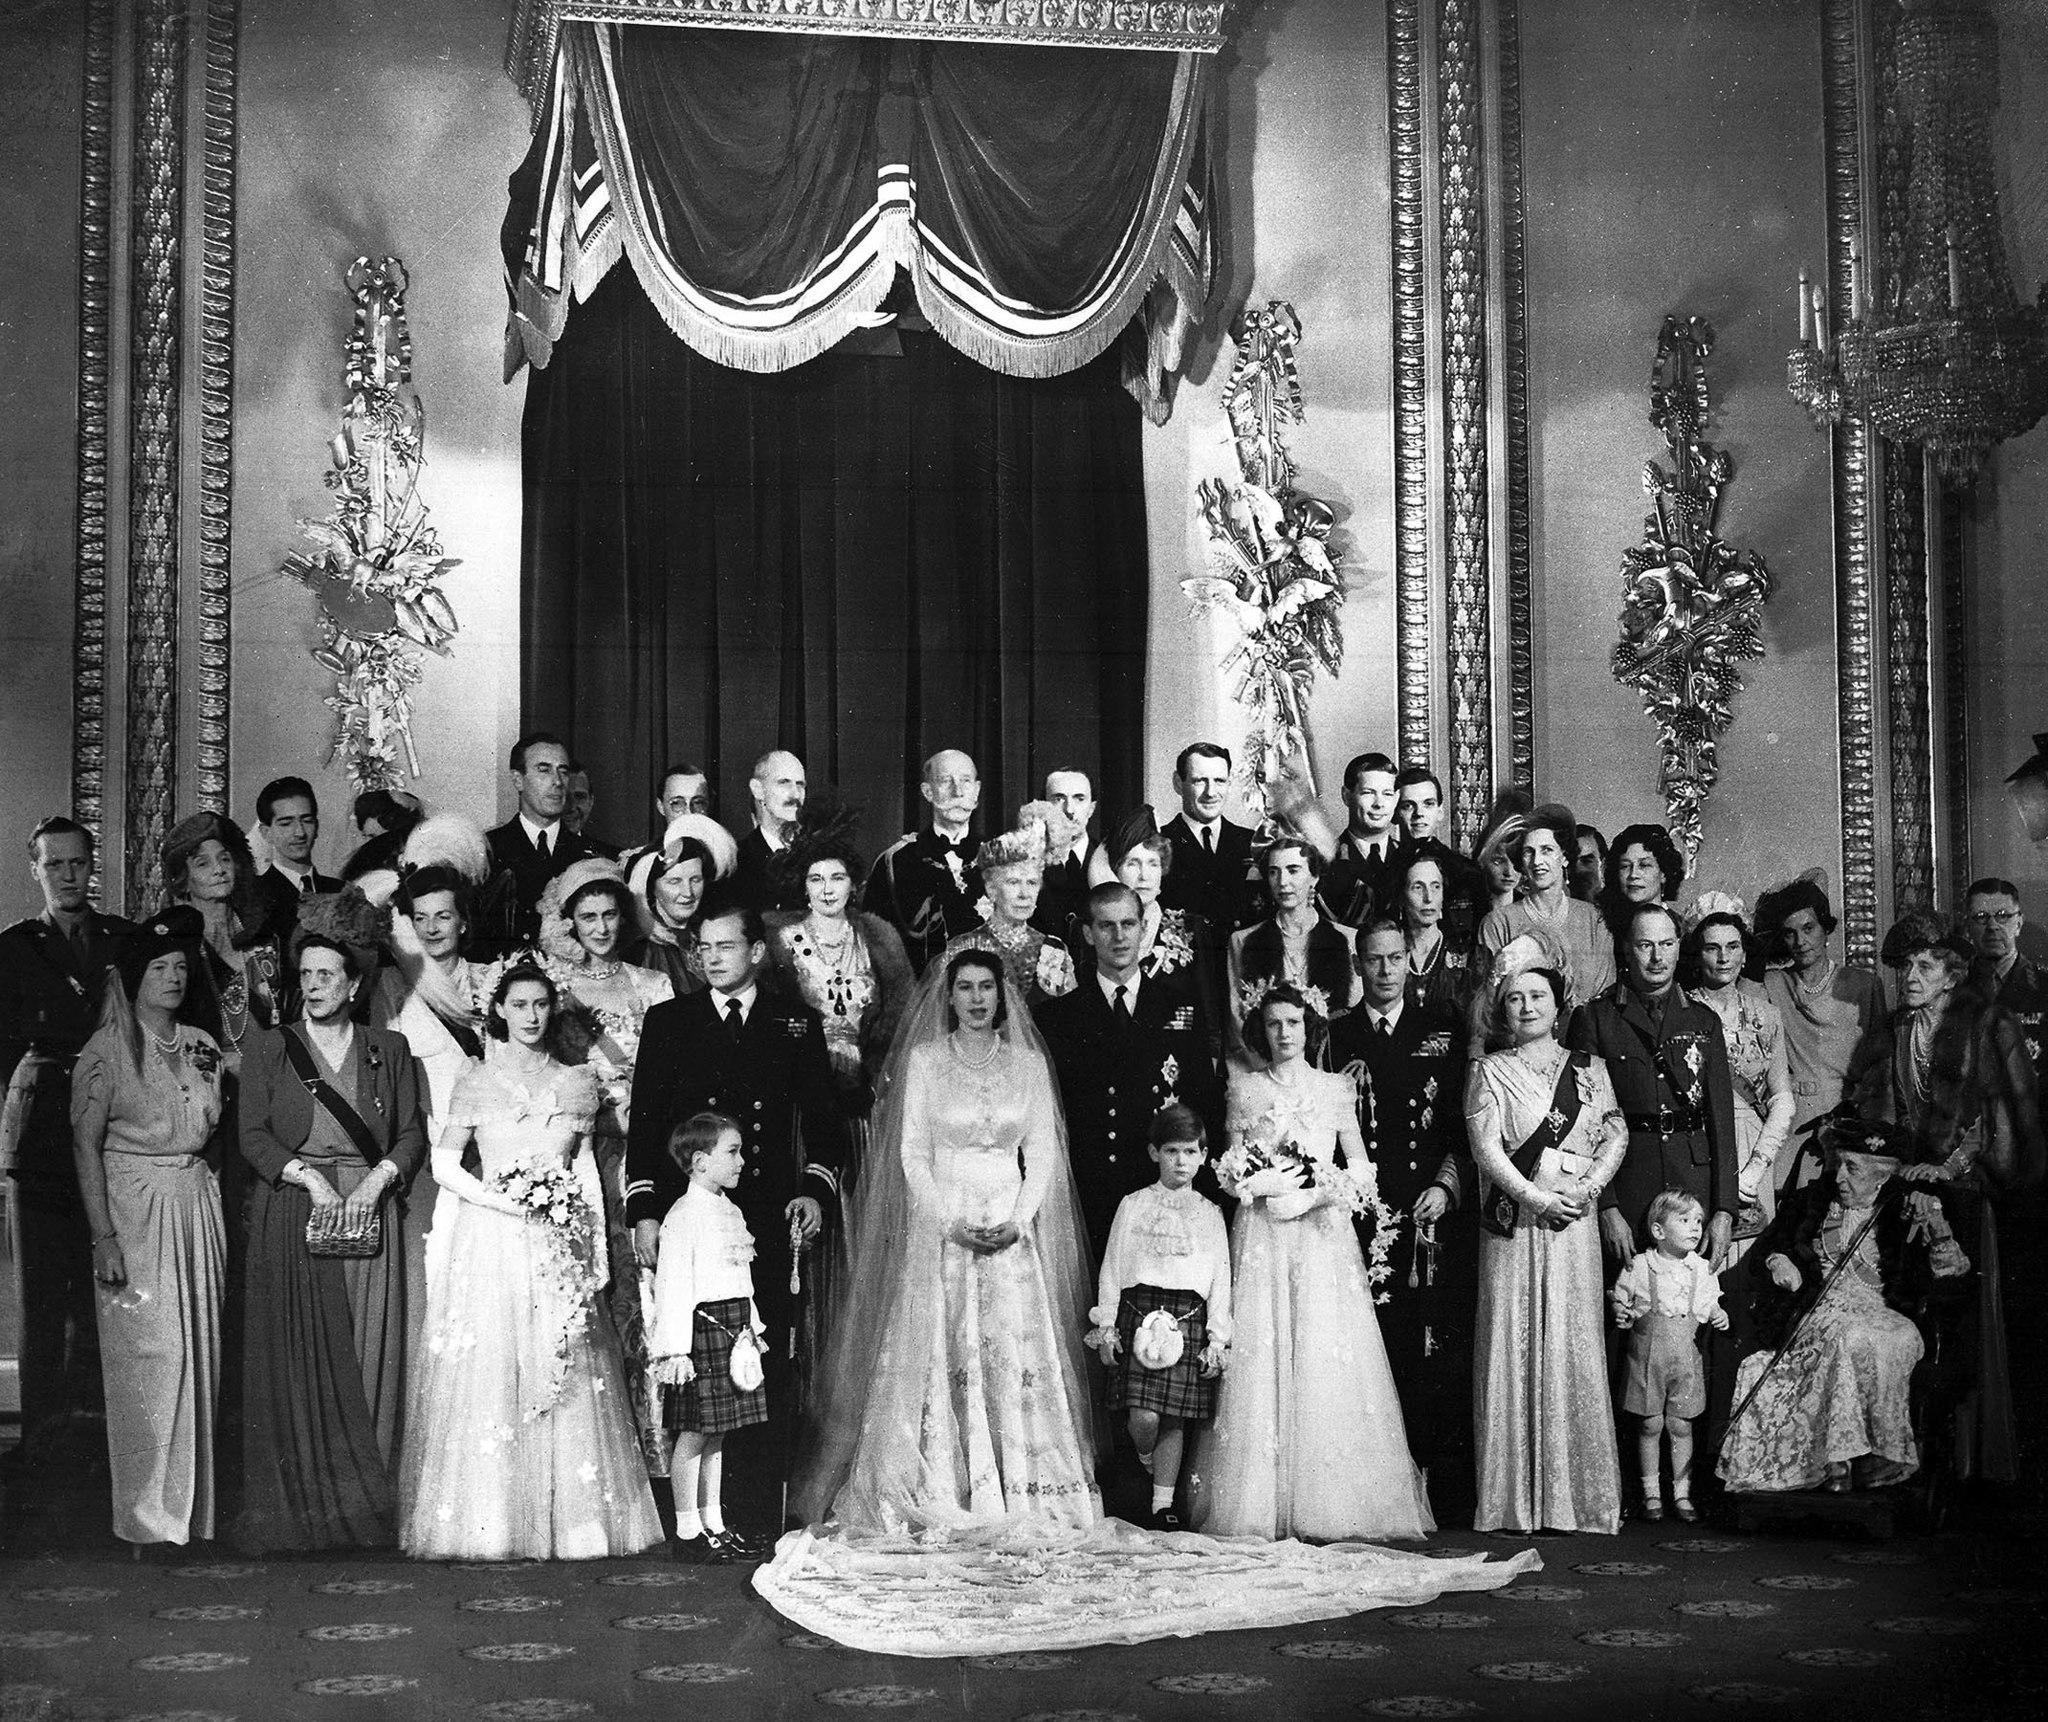 Buckingham Palace wedding picture